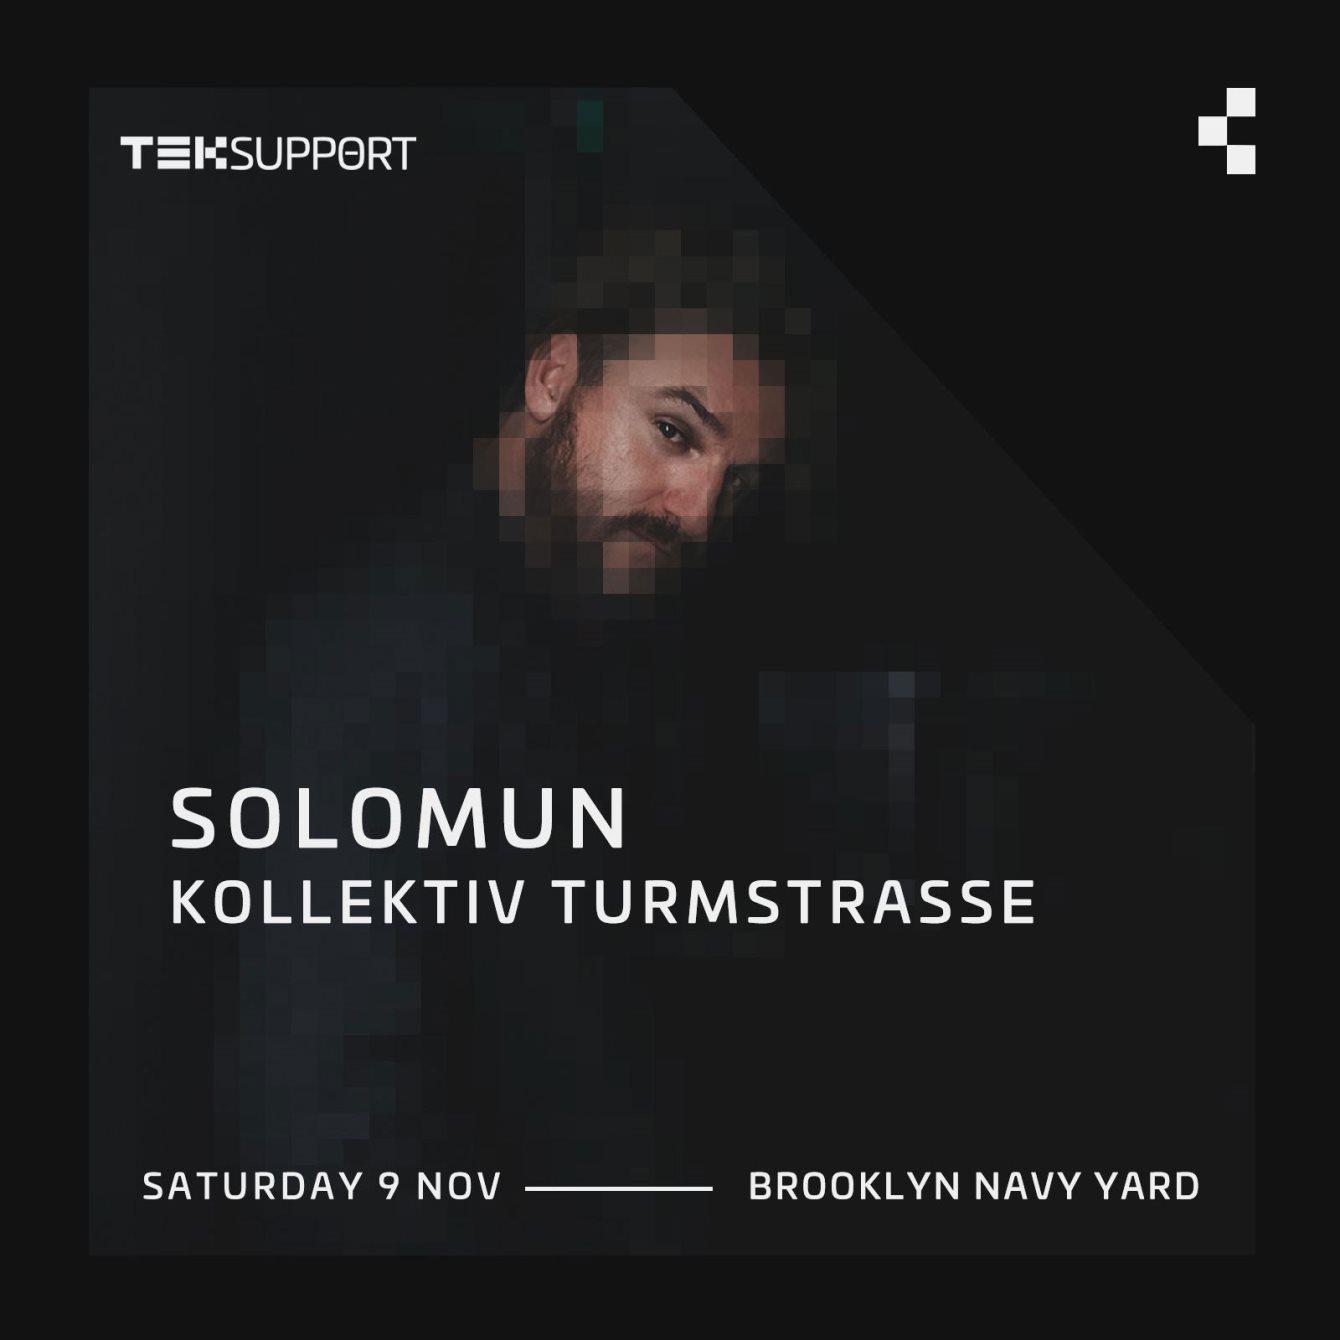 Teksupport: Solomun & Kollektiv Turmstrasse - Flyer back